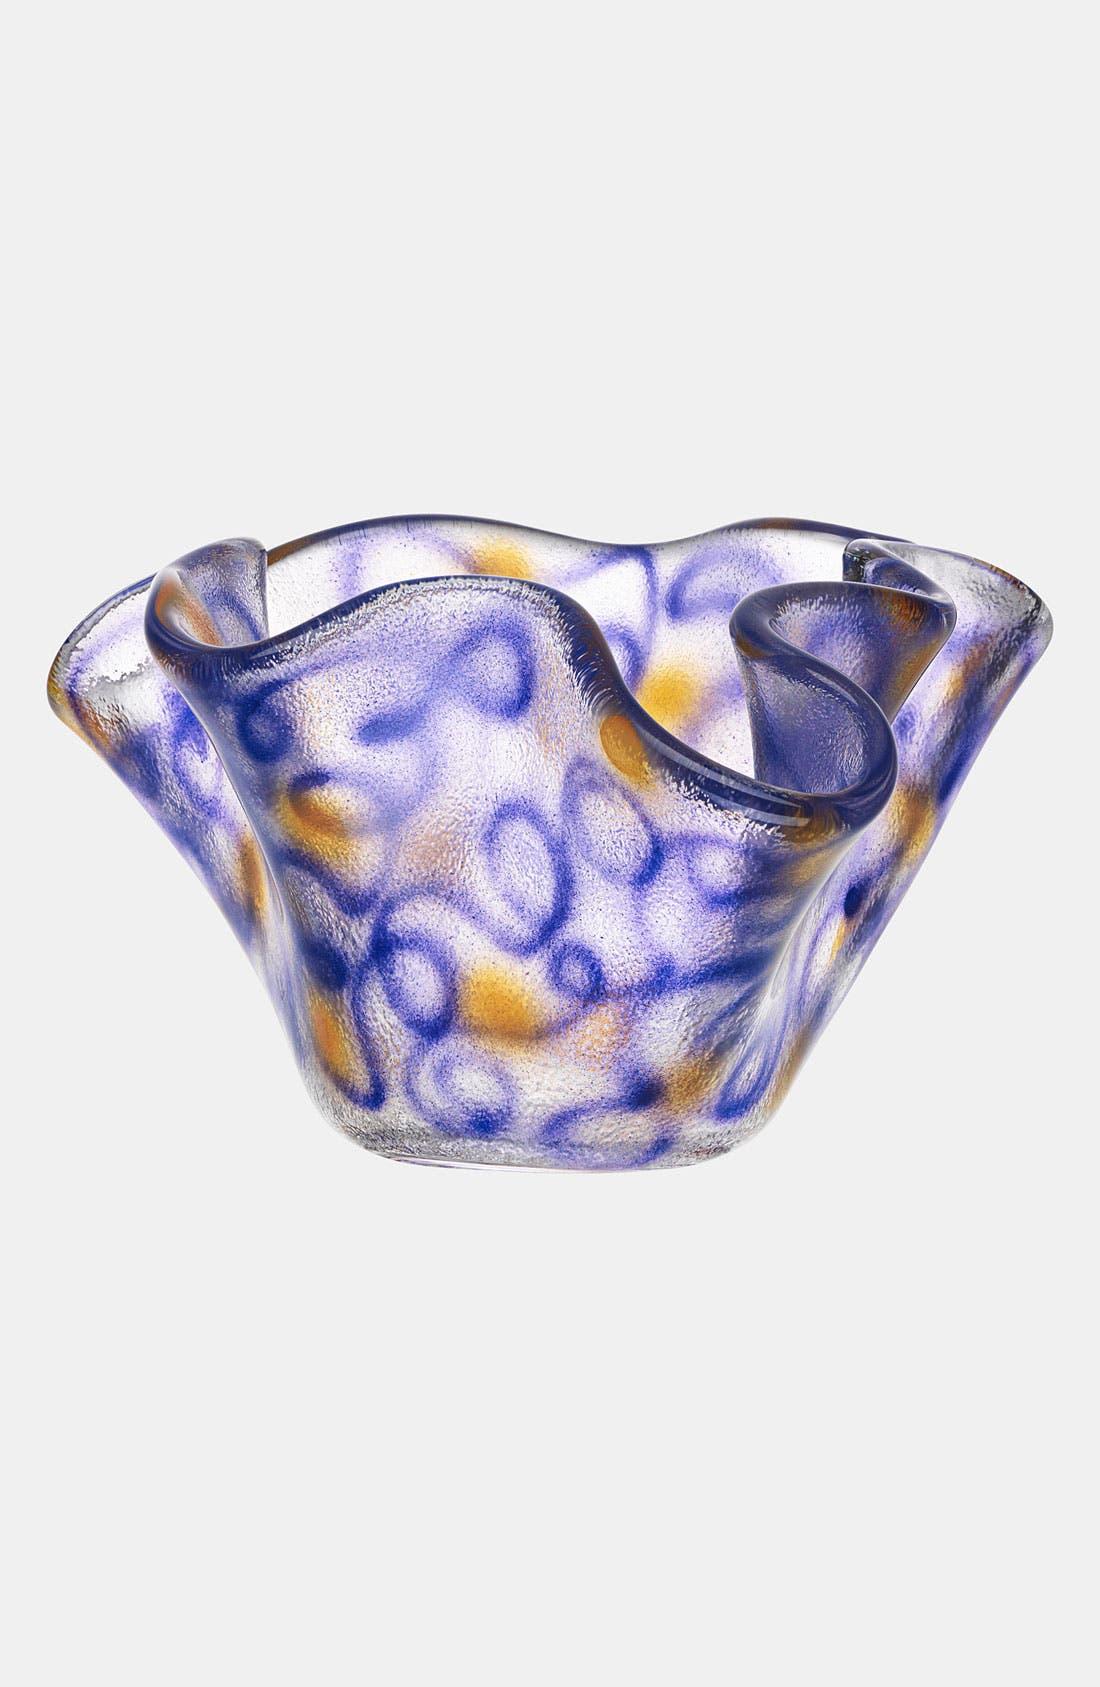 Main Image - Kosta Boda 'Happy Going' Small Bowl